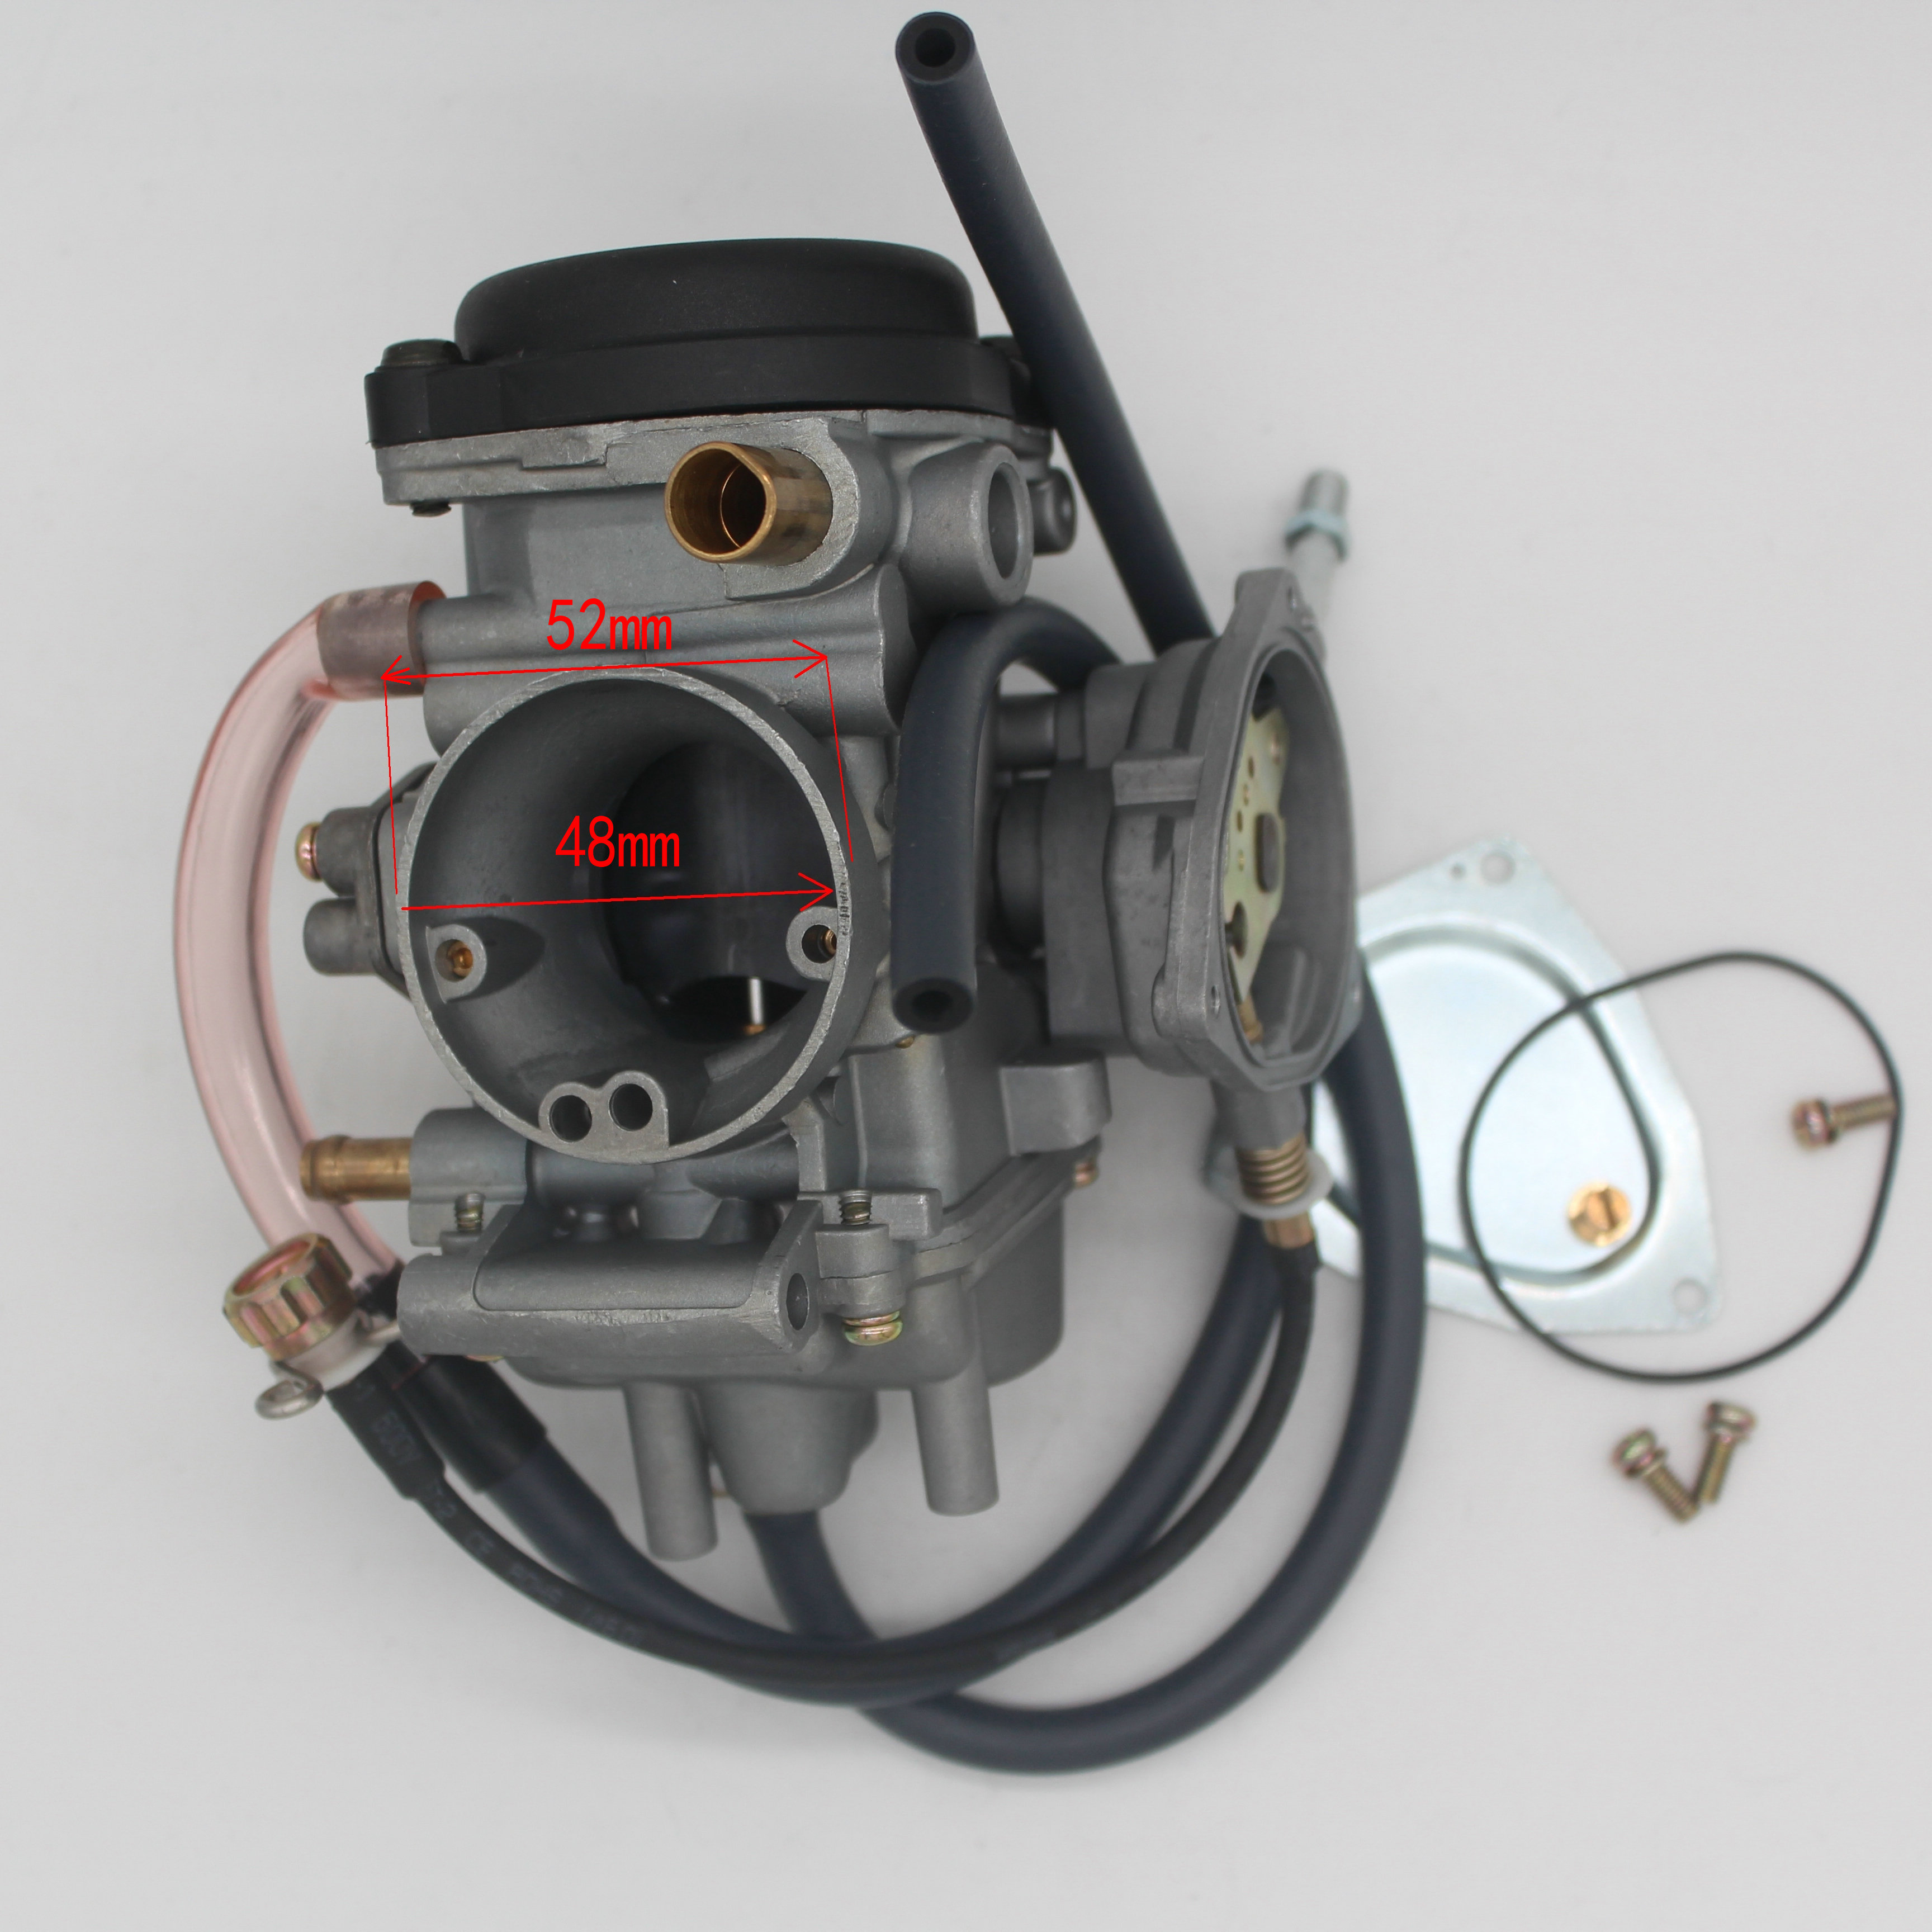 🛒 Alconstar CVK30 Carburetor with heater for Aeolus VOG ATV